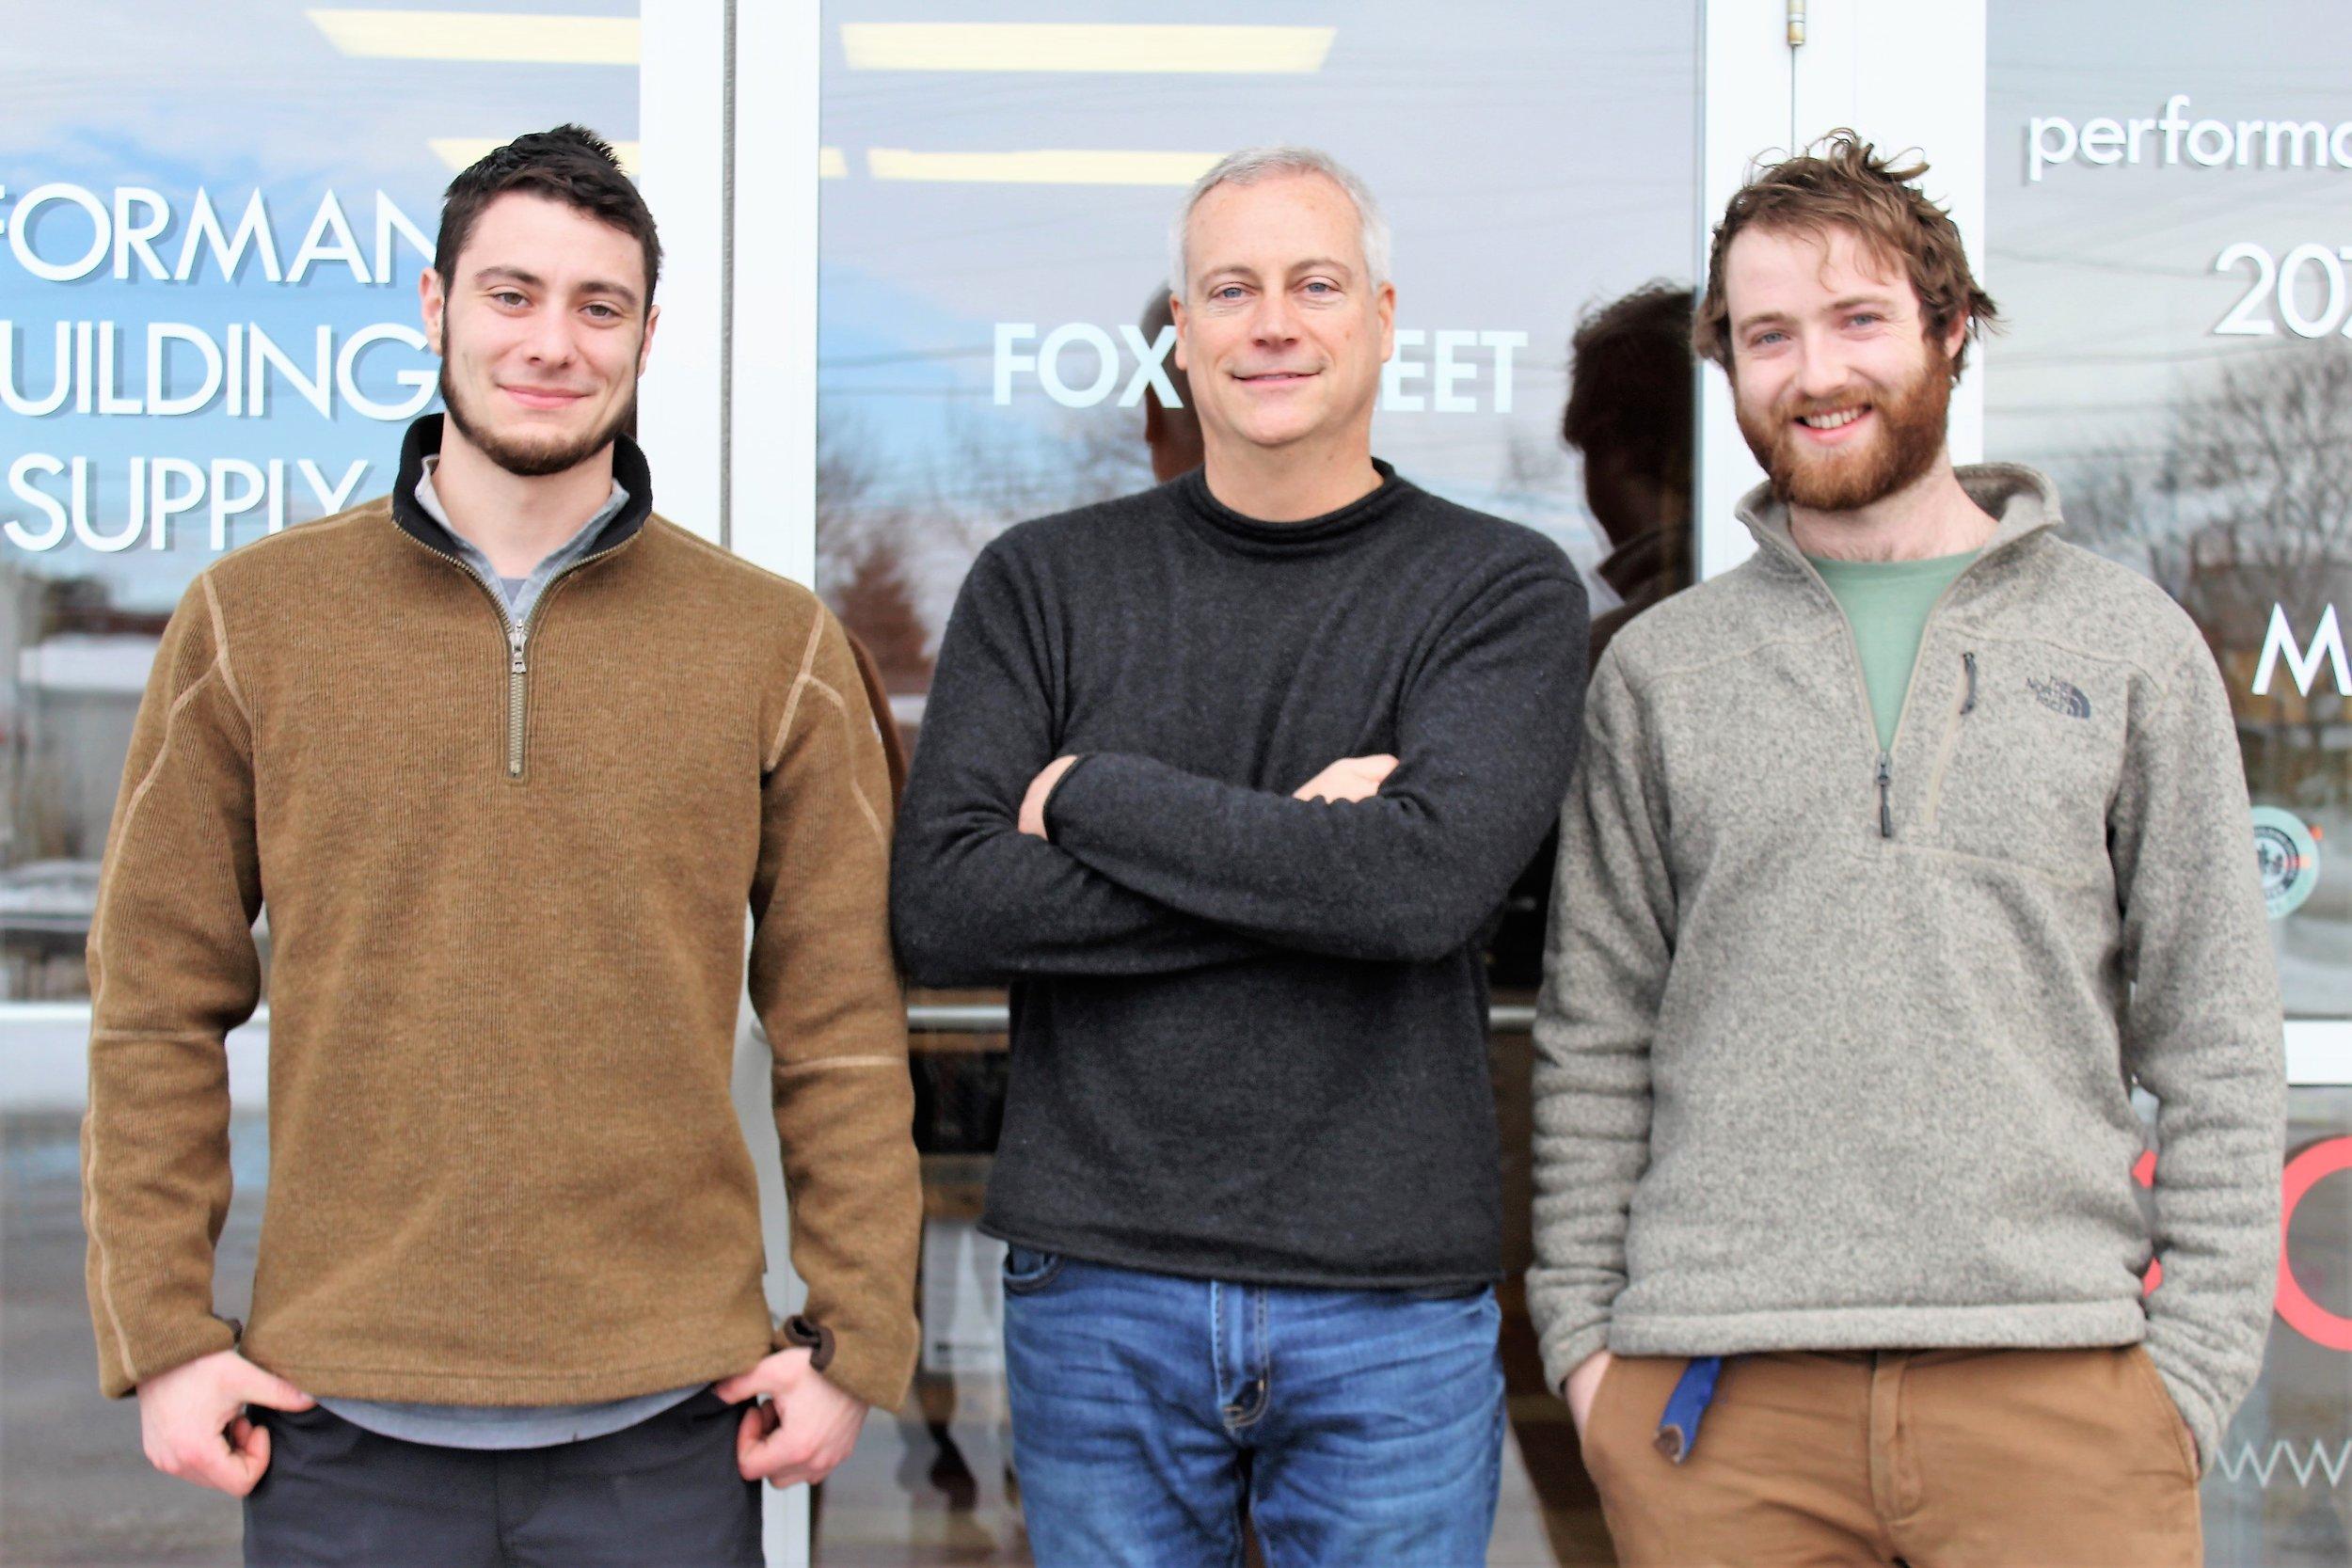 Zak Konstantino, Steve Konstantino and Ben McCrave outside the Performance Building Supply Showroom.